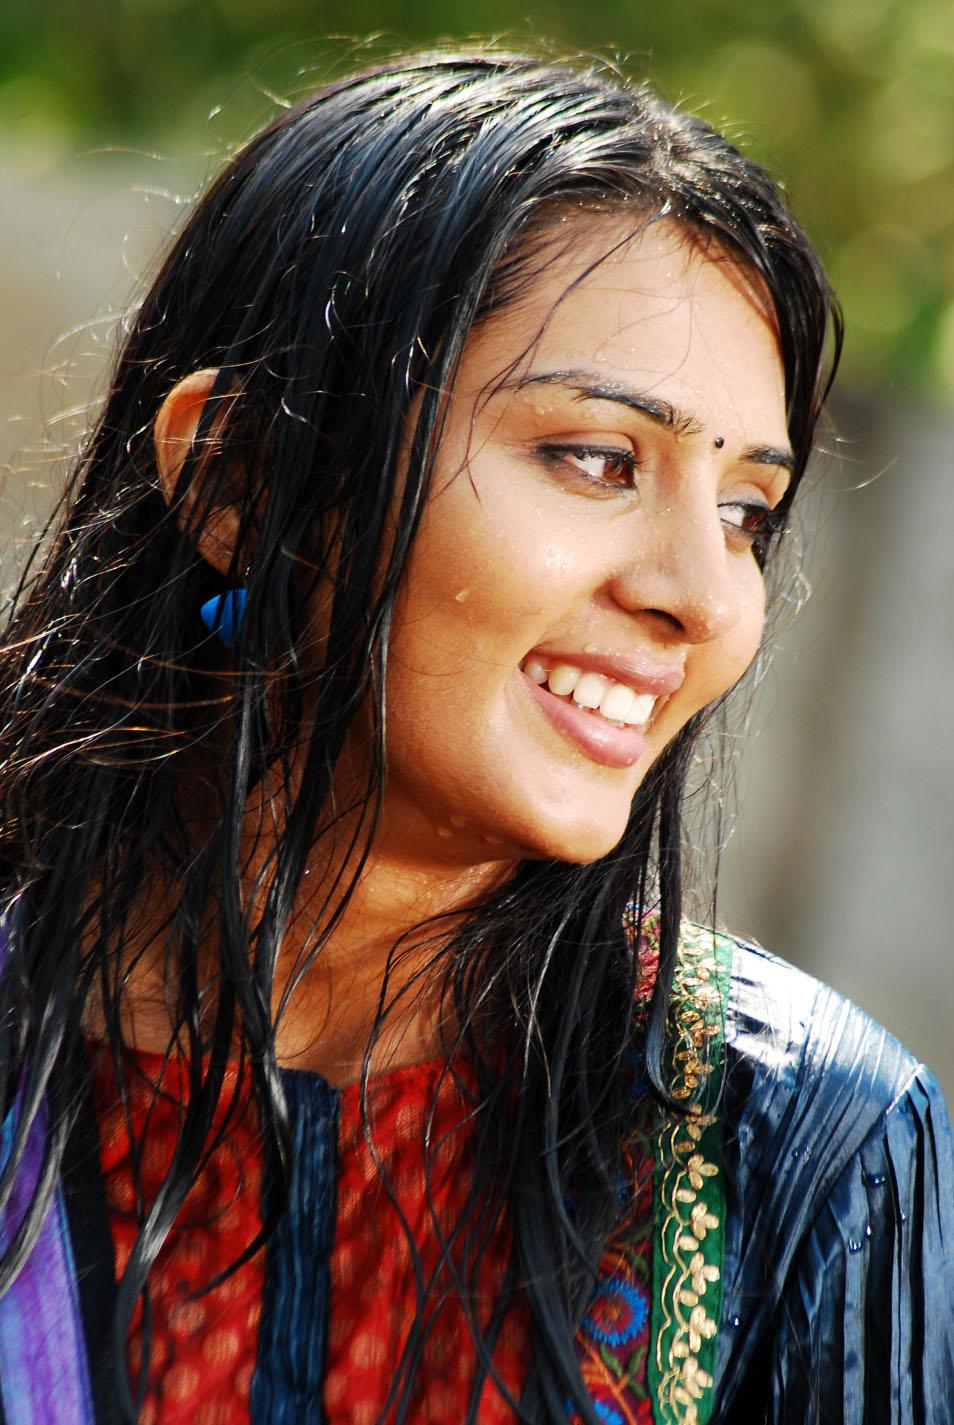 Adultmoviexxx Stunning actress sindhu hot photo gallery - 7 pics